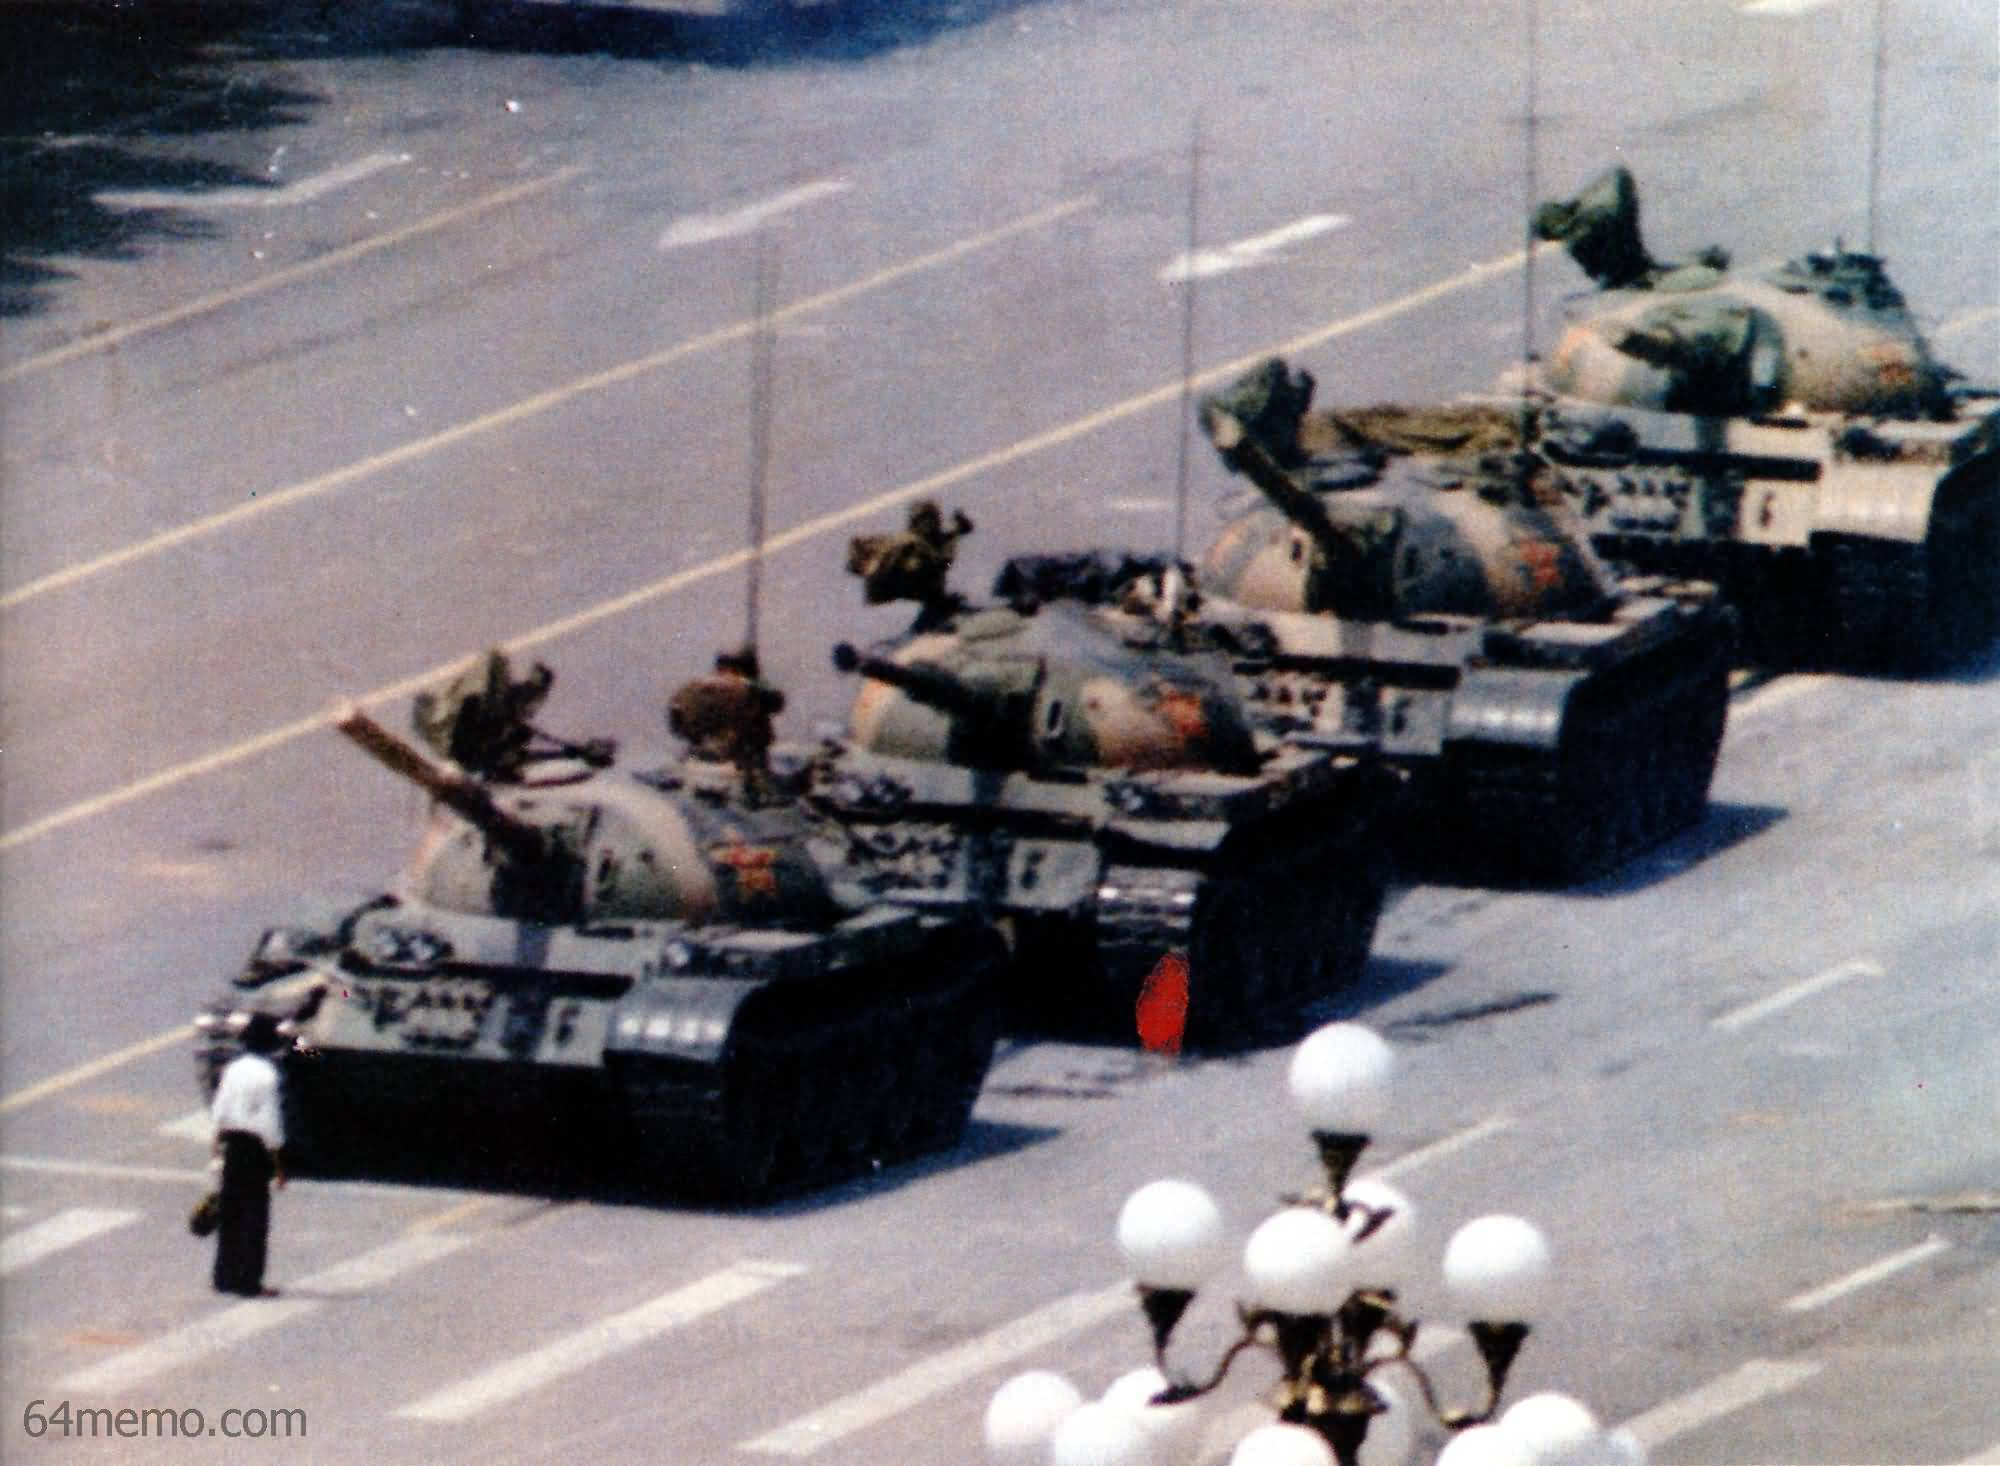 Tank Man, 1989 Tiananmen Square protests